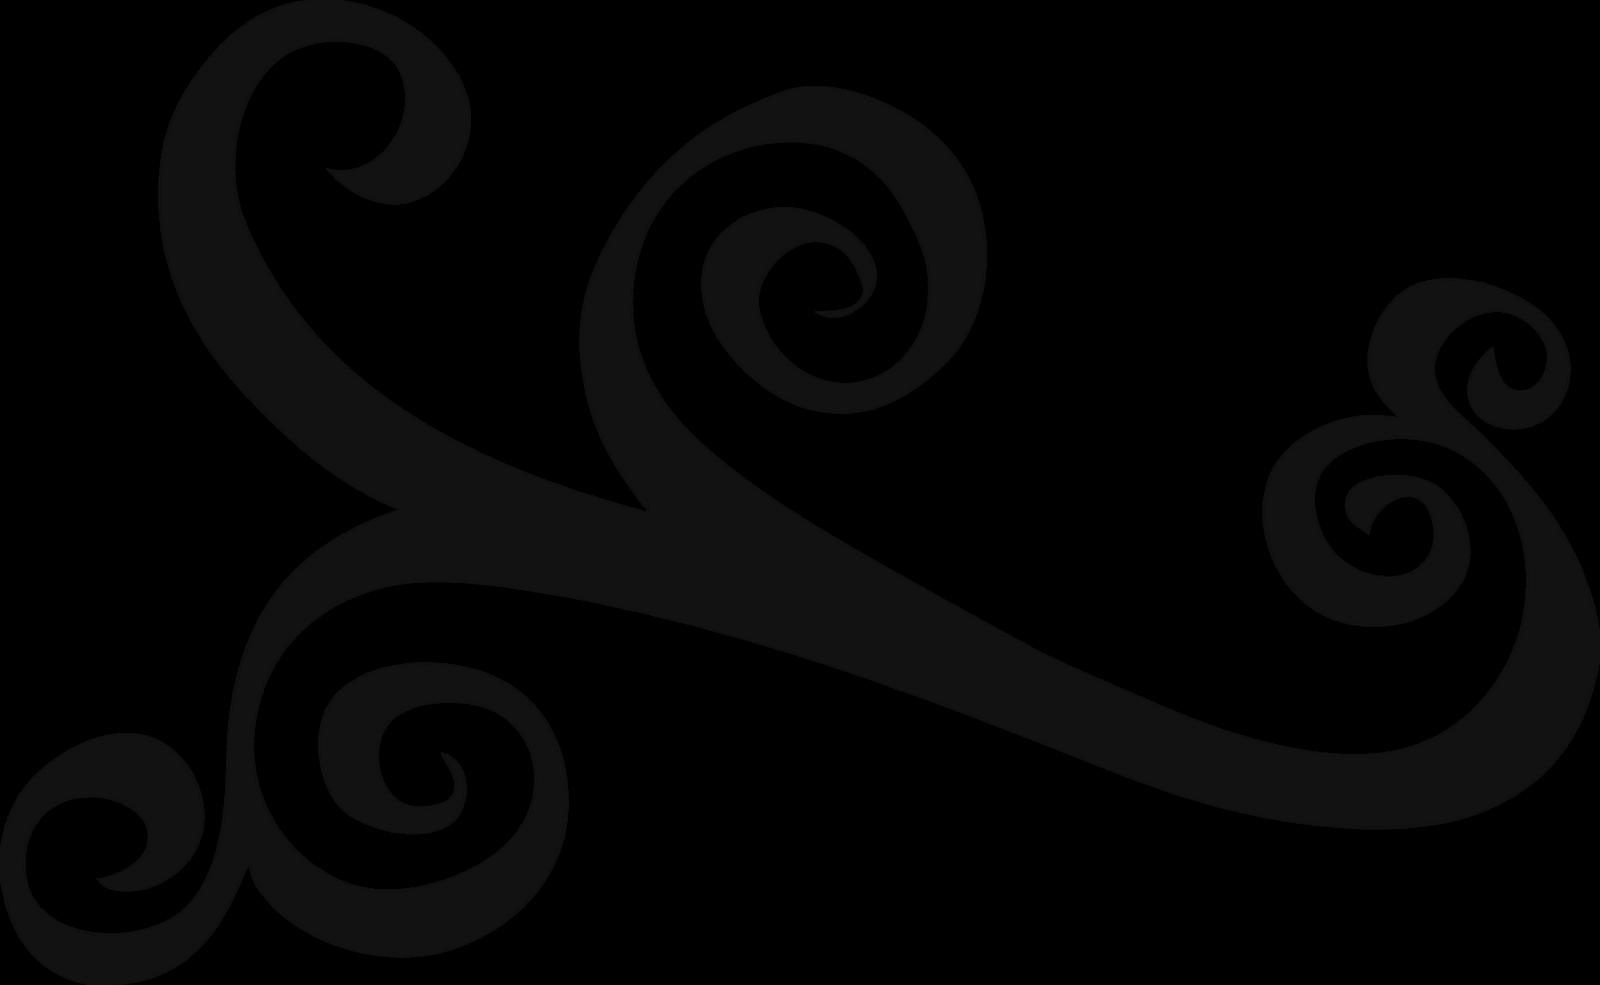 clipart design dMiL4y9ca